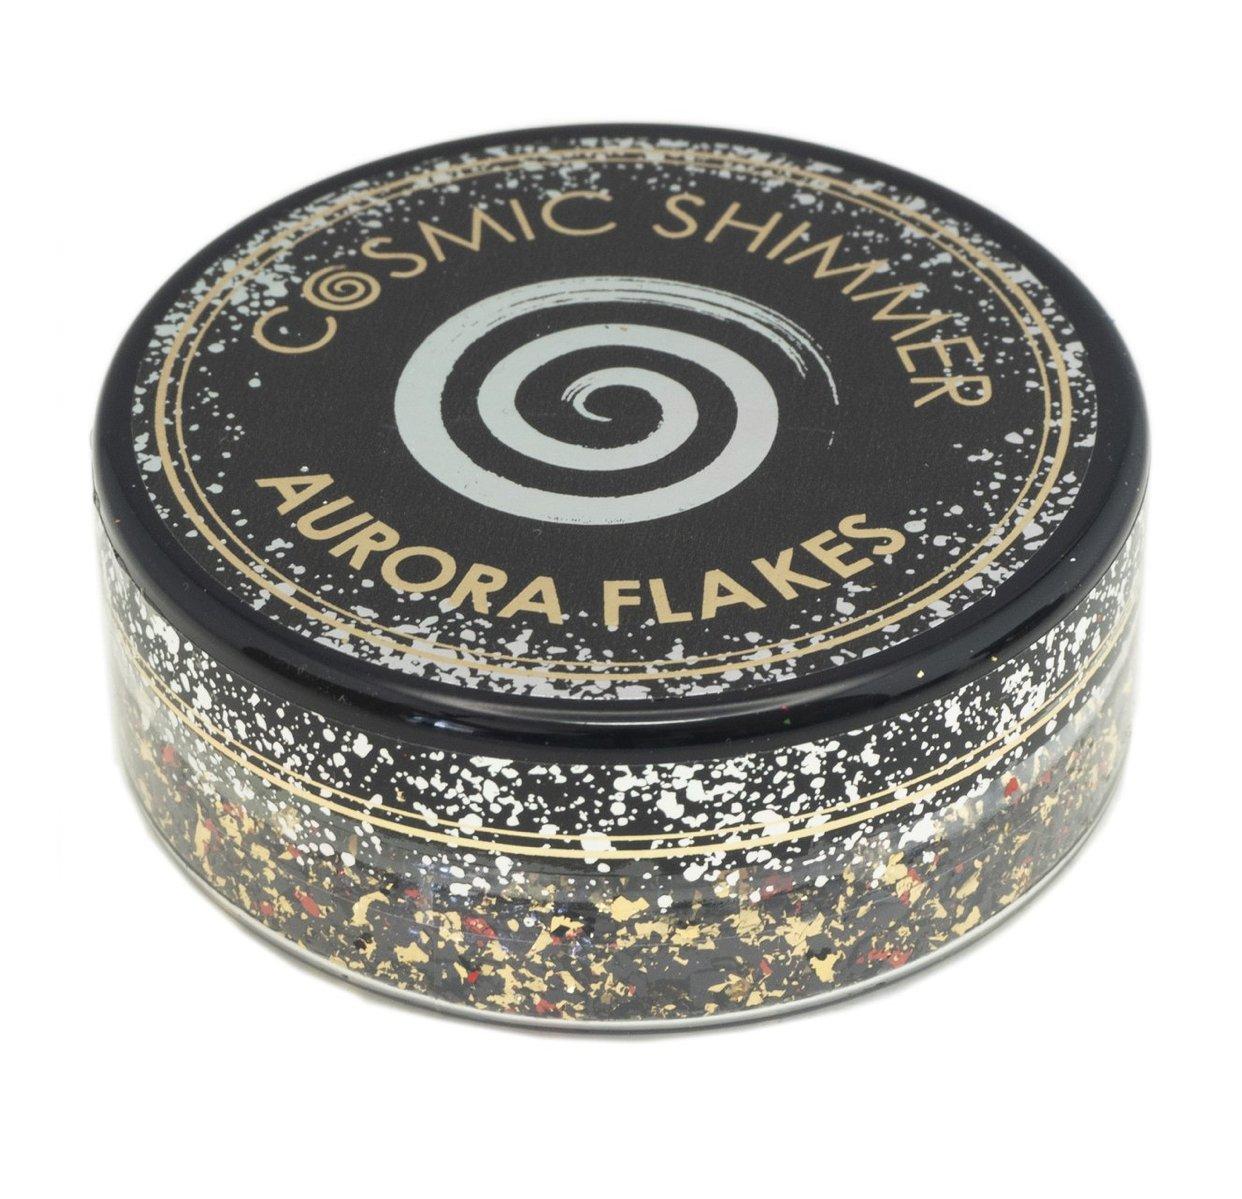 Aurora Flakes- Firefly Sparkle